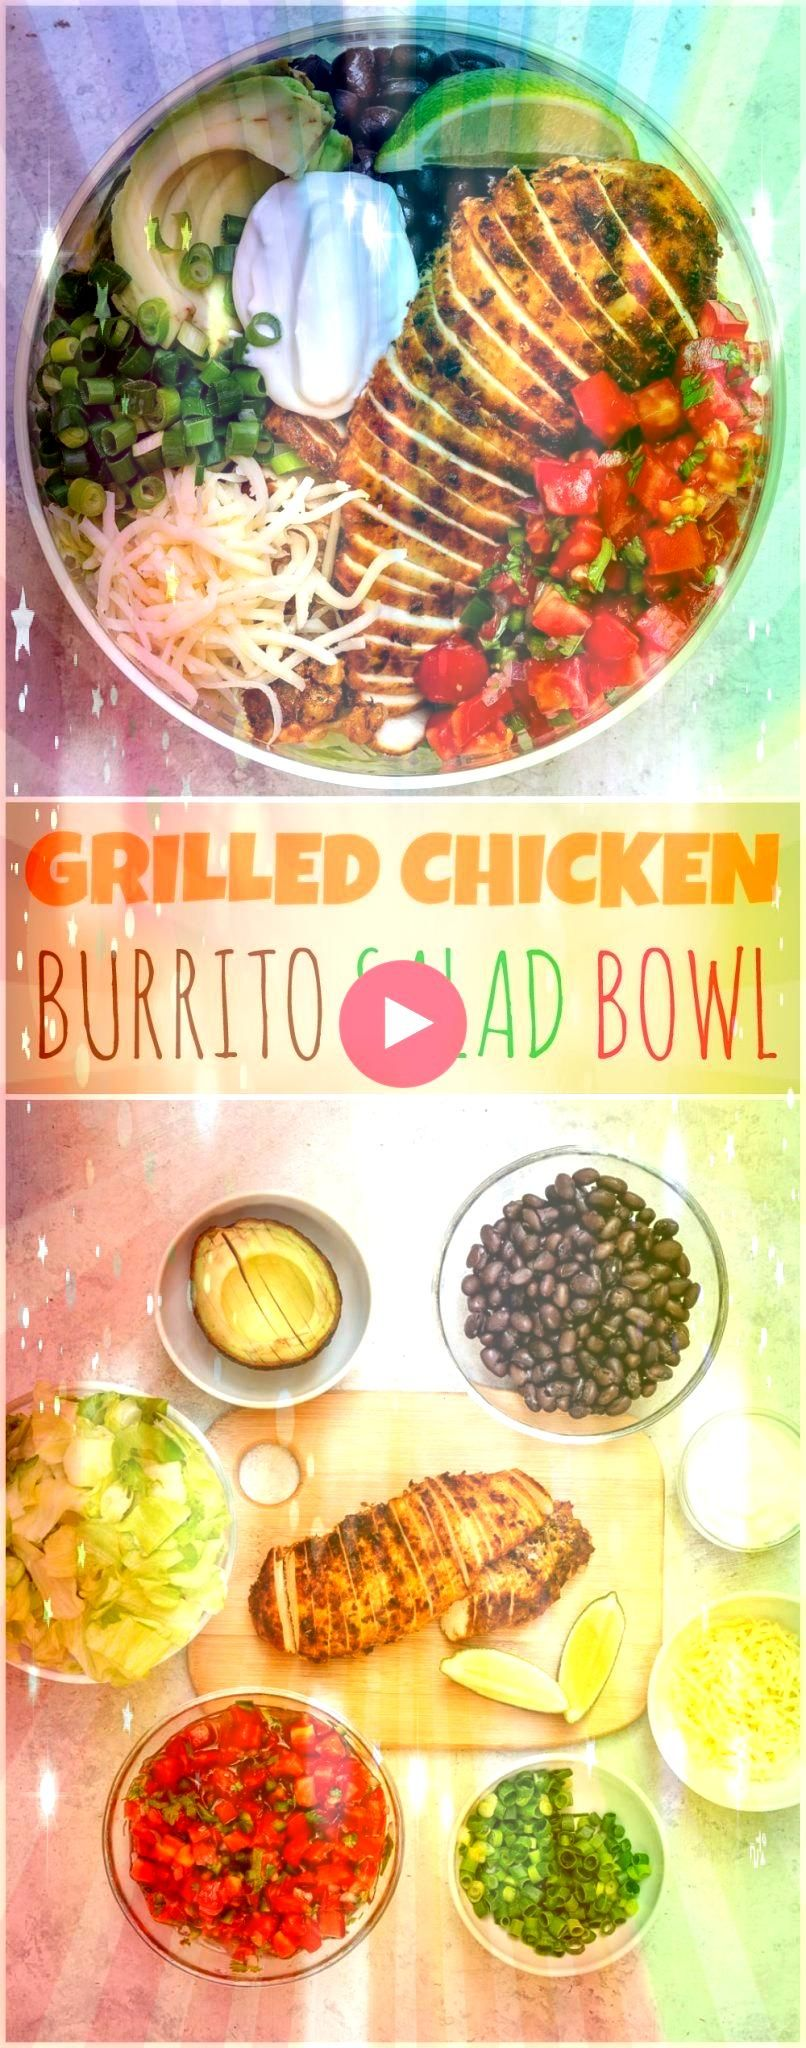 Chicken Meal Prep Bowls 4 Creative Ways for Clean Eating  Clean Food CrushGrilled Chicken Meal Prep Bowls 4 Creative Ways for Clean Eating  Clean Food Crush Raw zucchini...